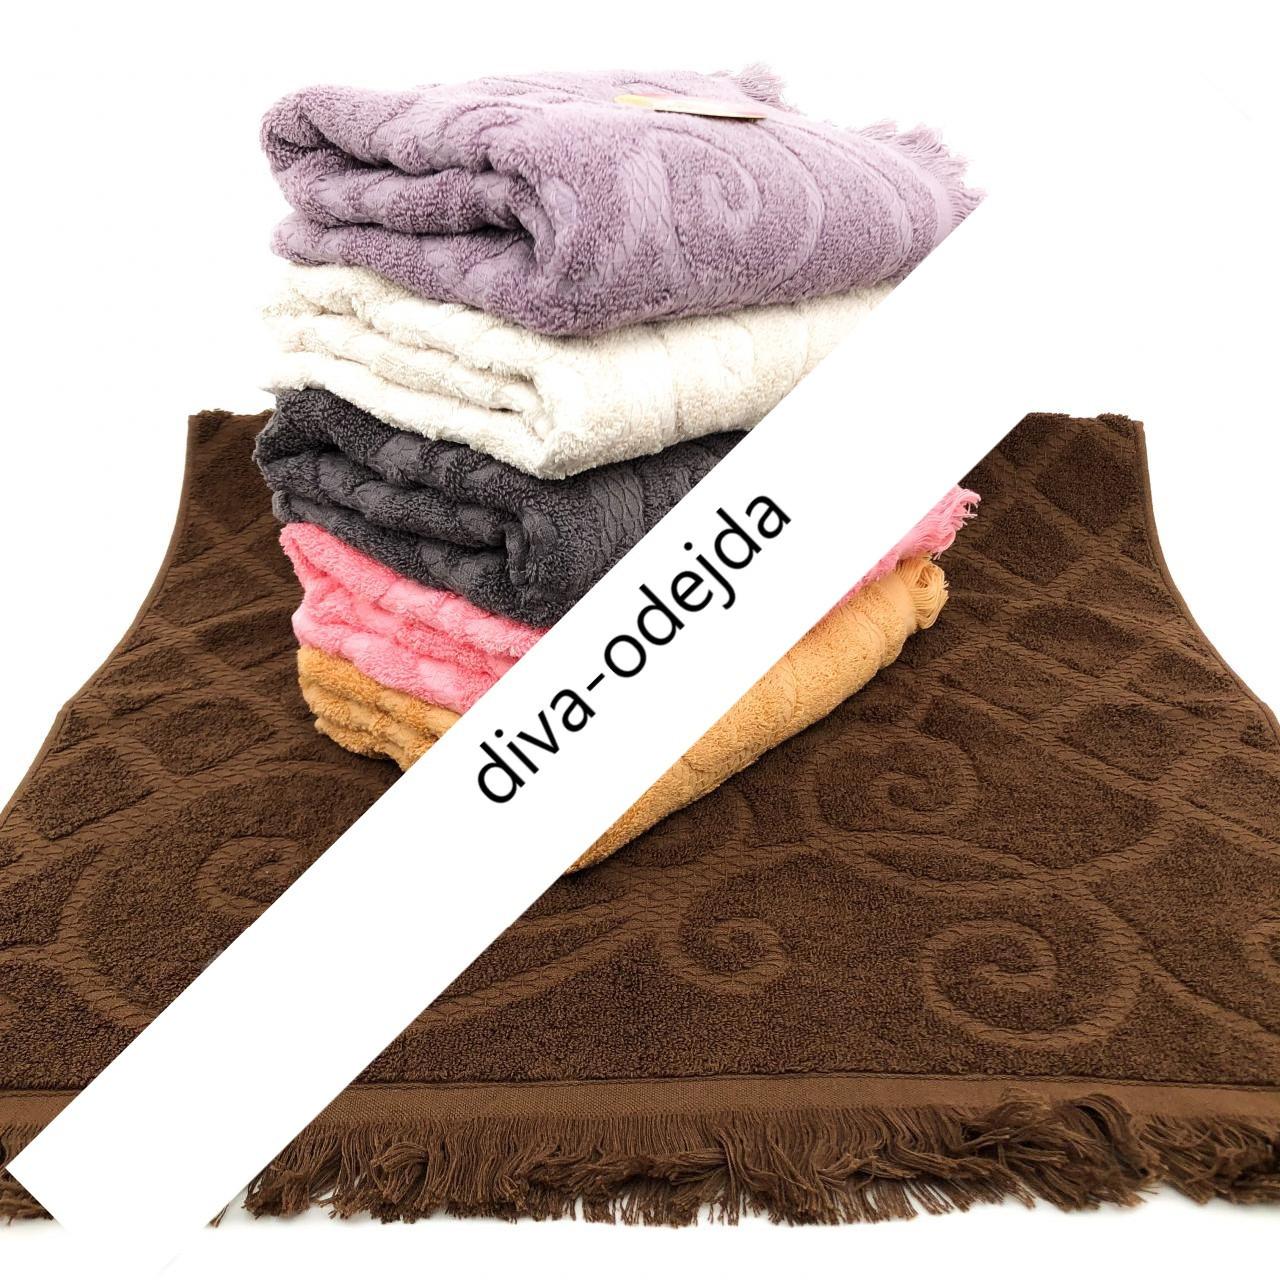 Лицевое полотенце с бахромой по краю.Размер:1,0 x 0,5